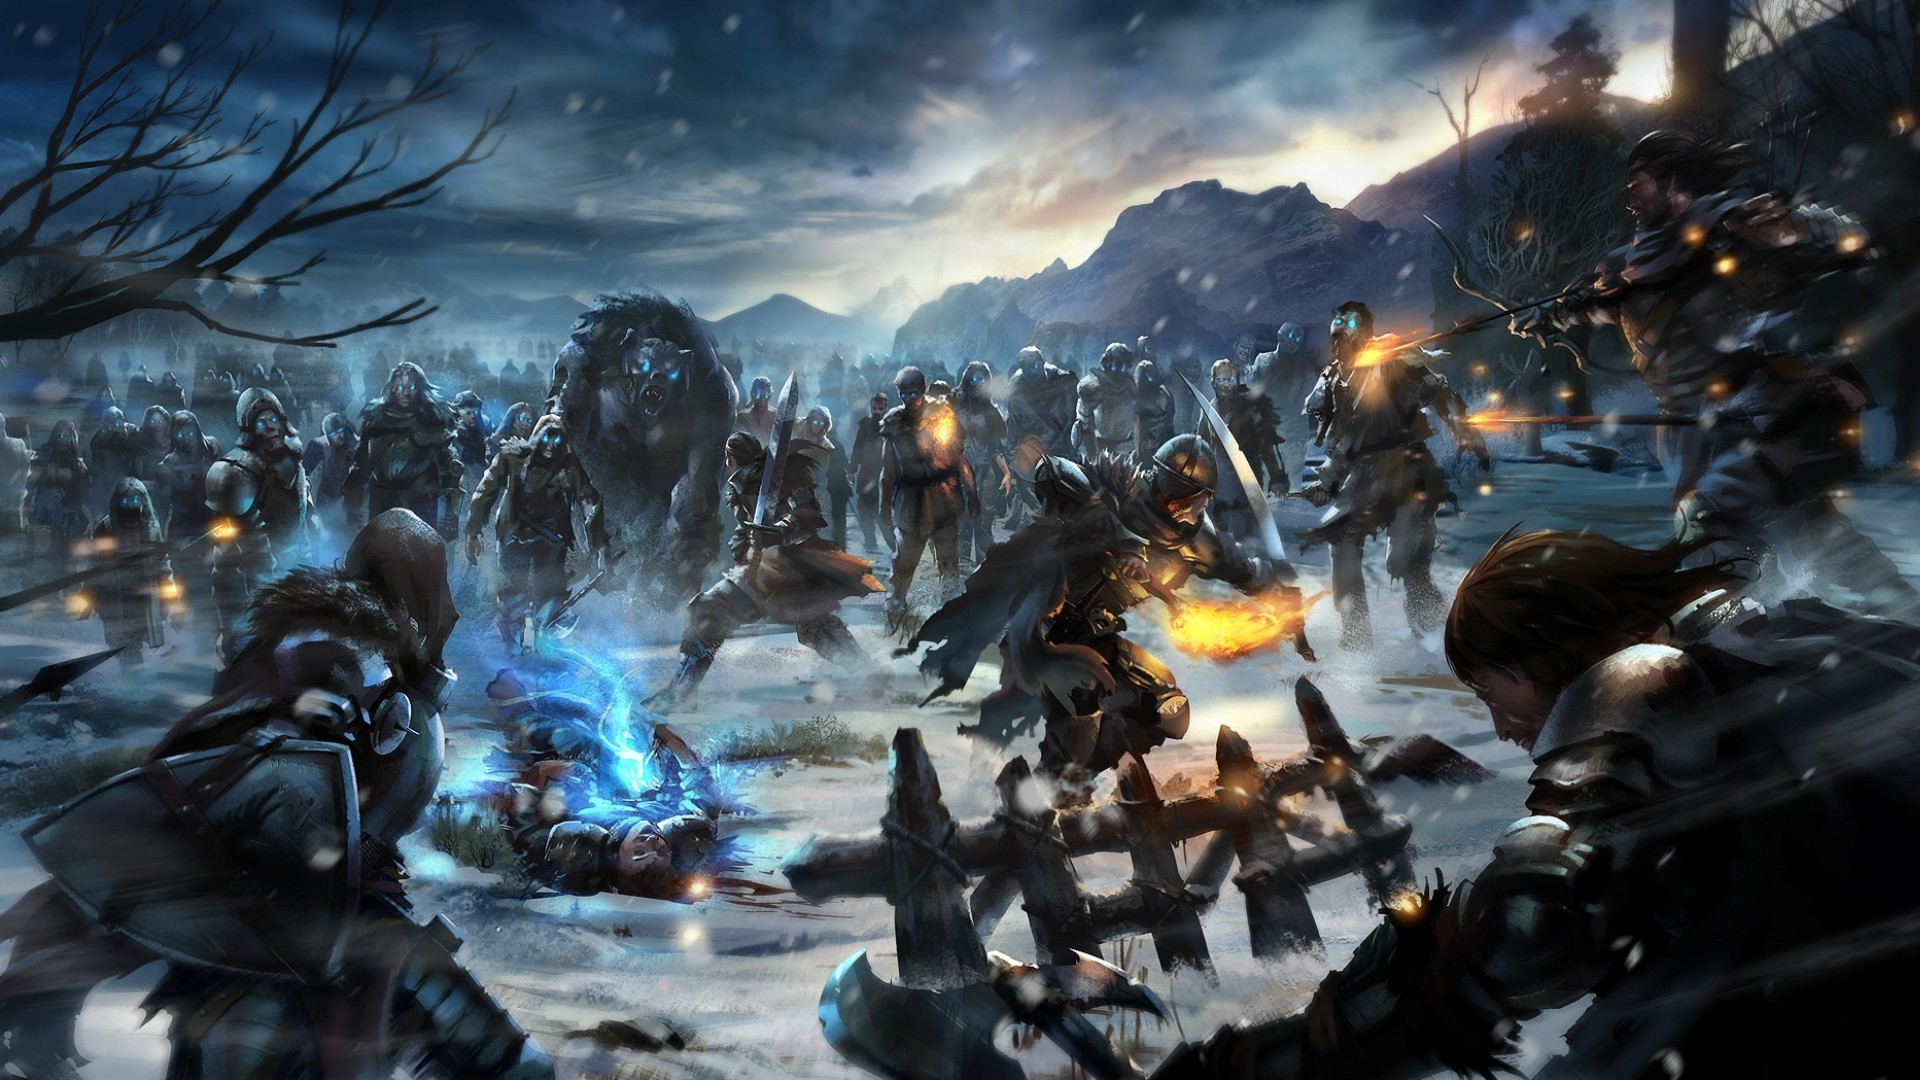 1920x1080 Wallpaper Tron Girl Game Of Thrones White Walkers Video Games Fantasy Art